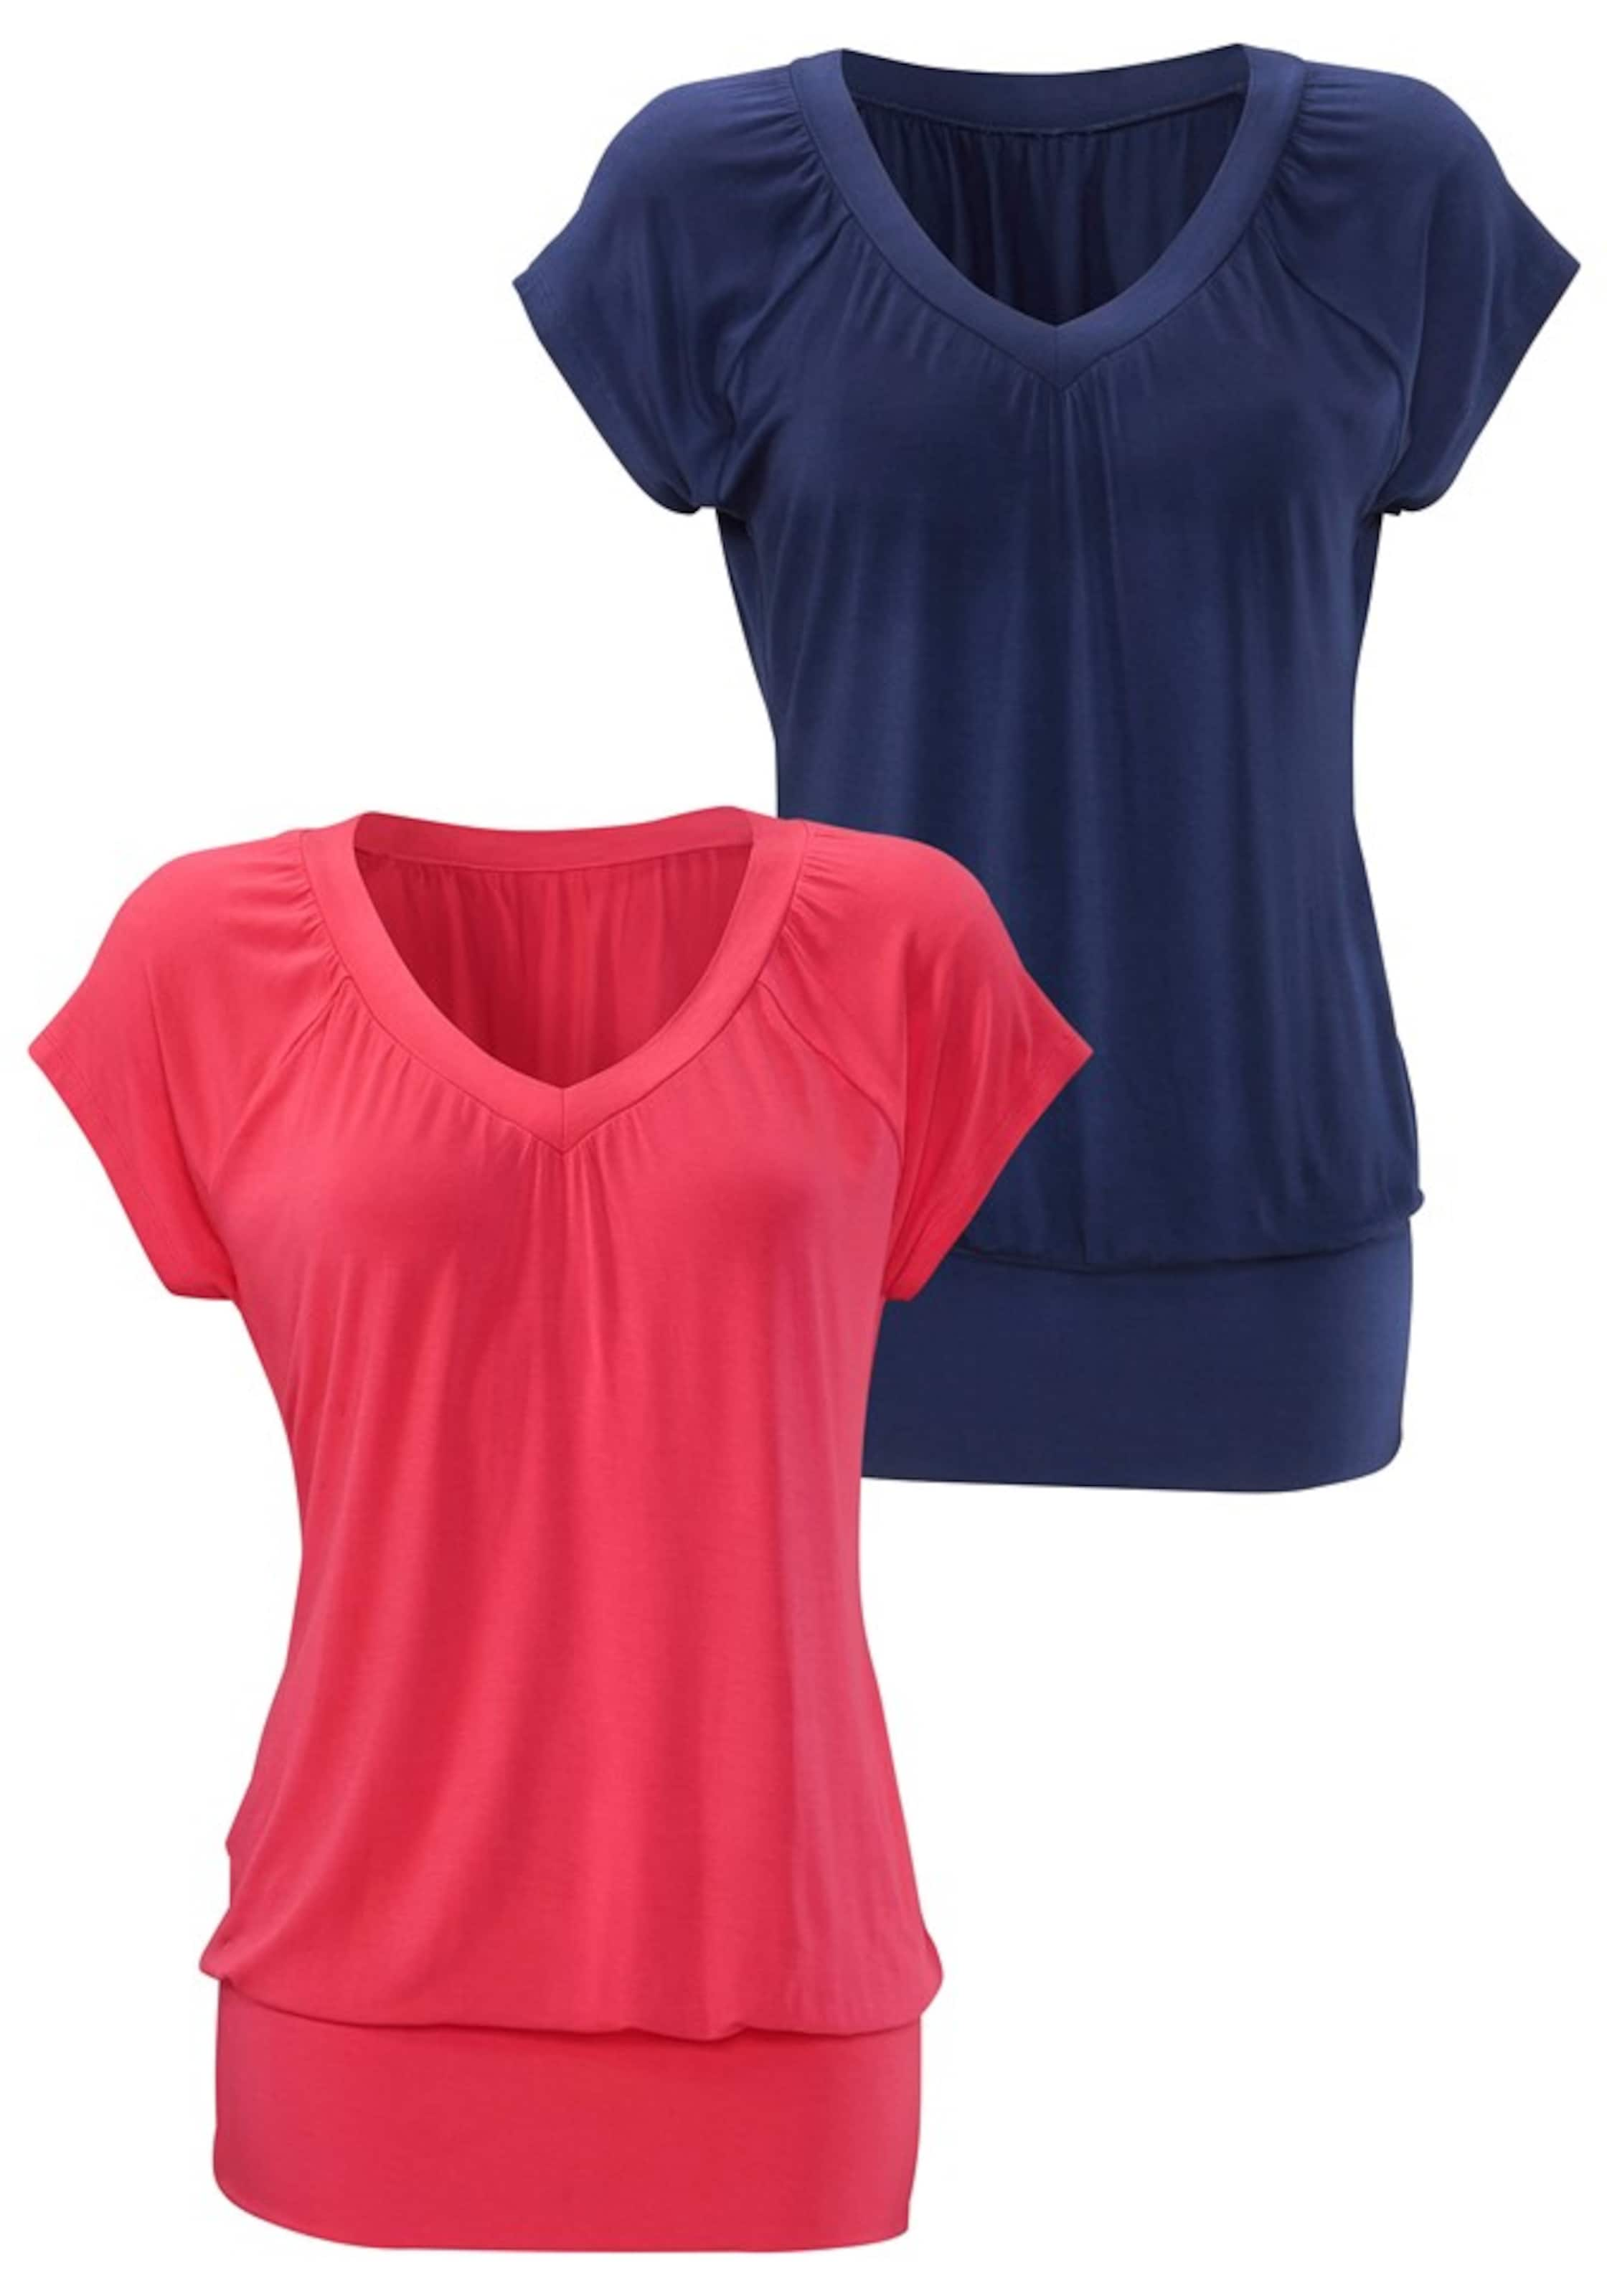 Lascana In MarineCranberry Lascana In Shirt Shirt Lascana MarineCranberry c3qSAL5j4R